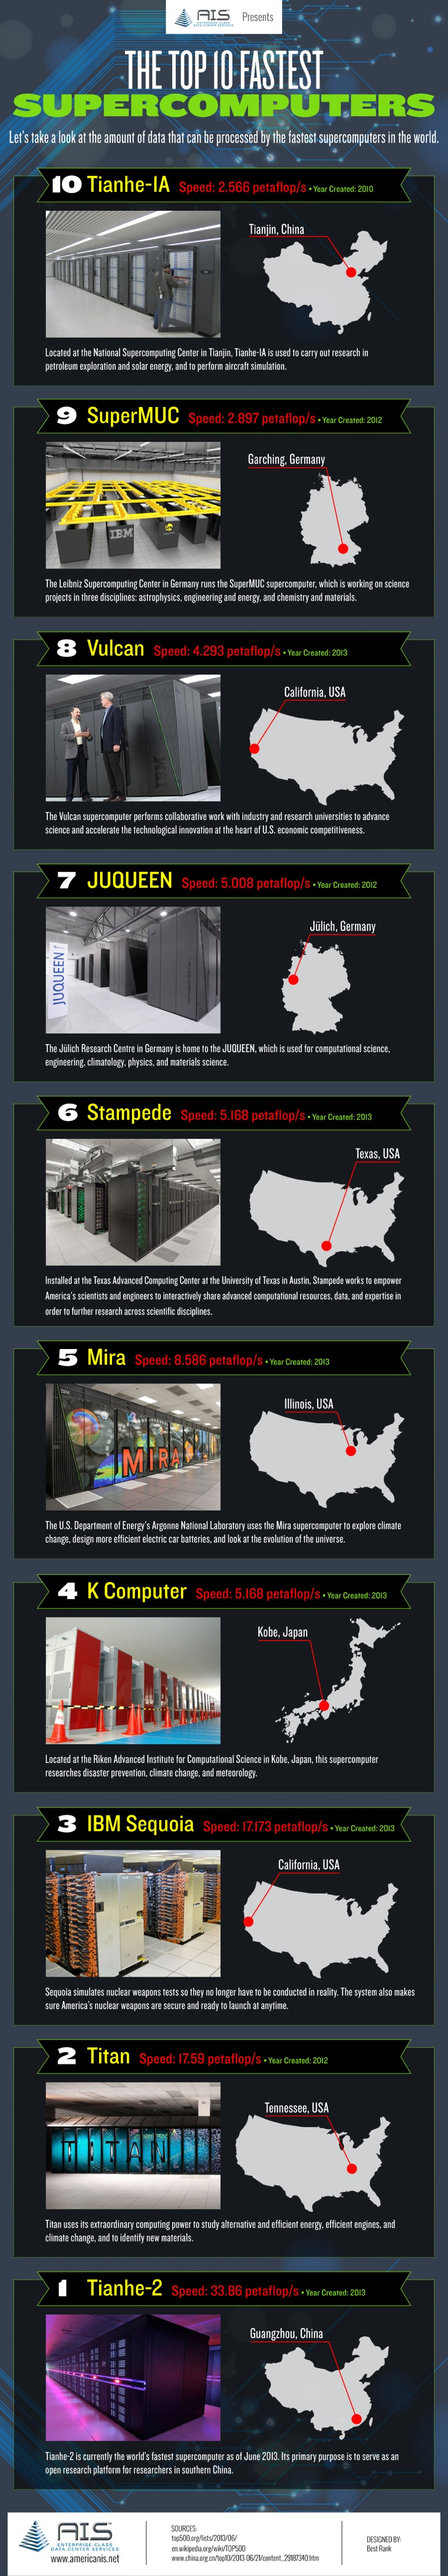 World's 10 Fastest Supercomputers